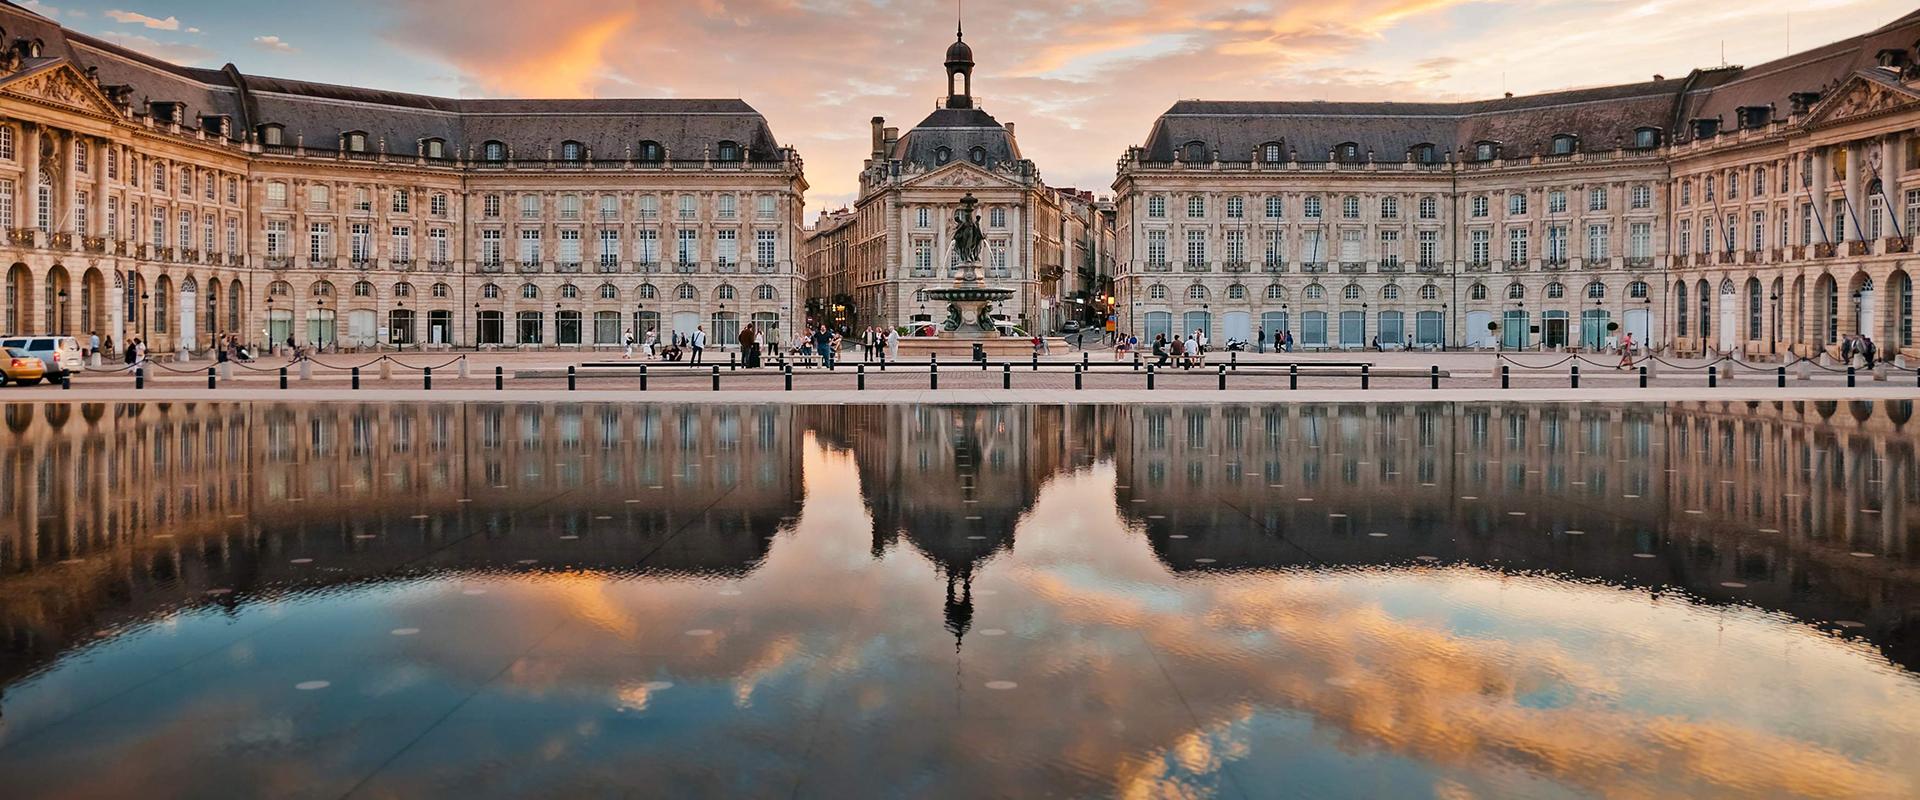 IPA Gironde